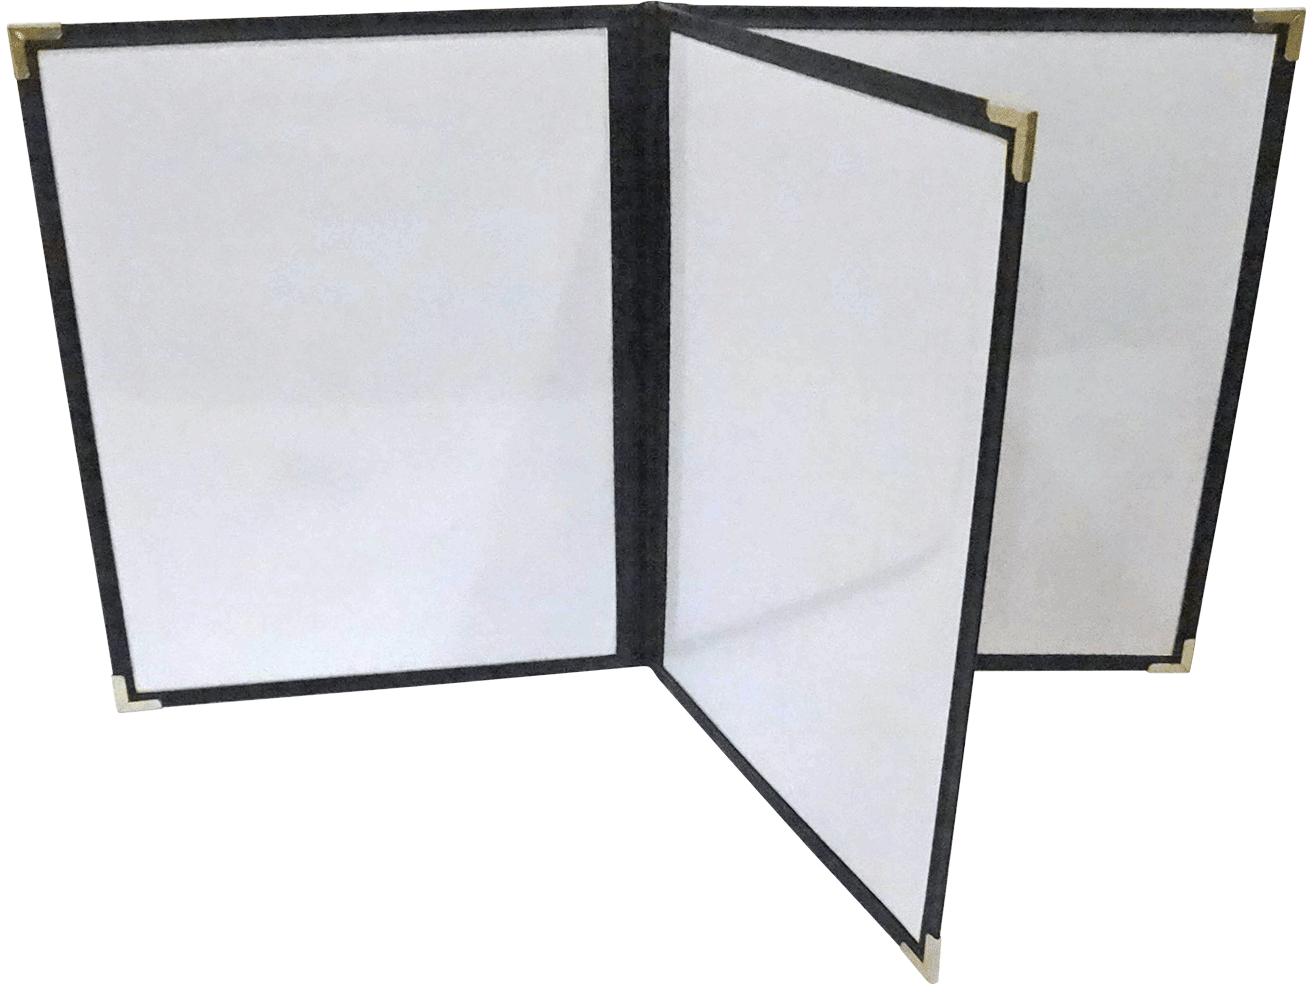 Portamenú modeloCDS-310B interior